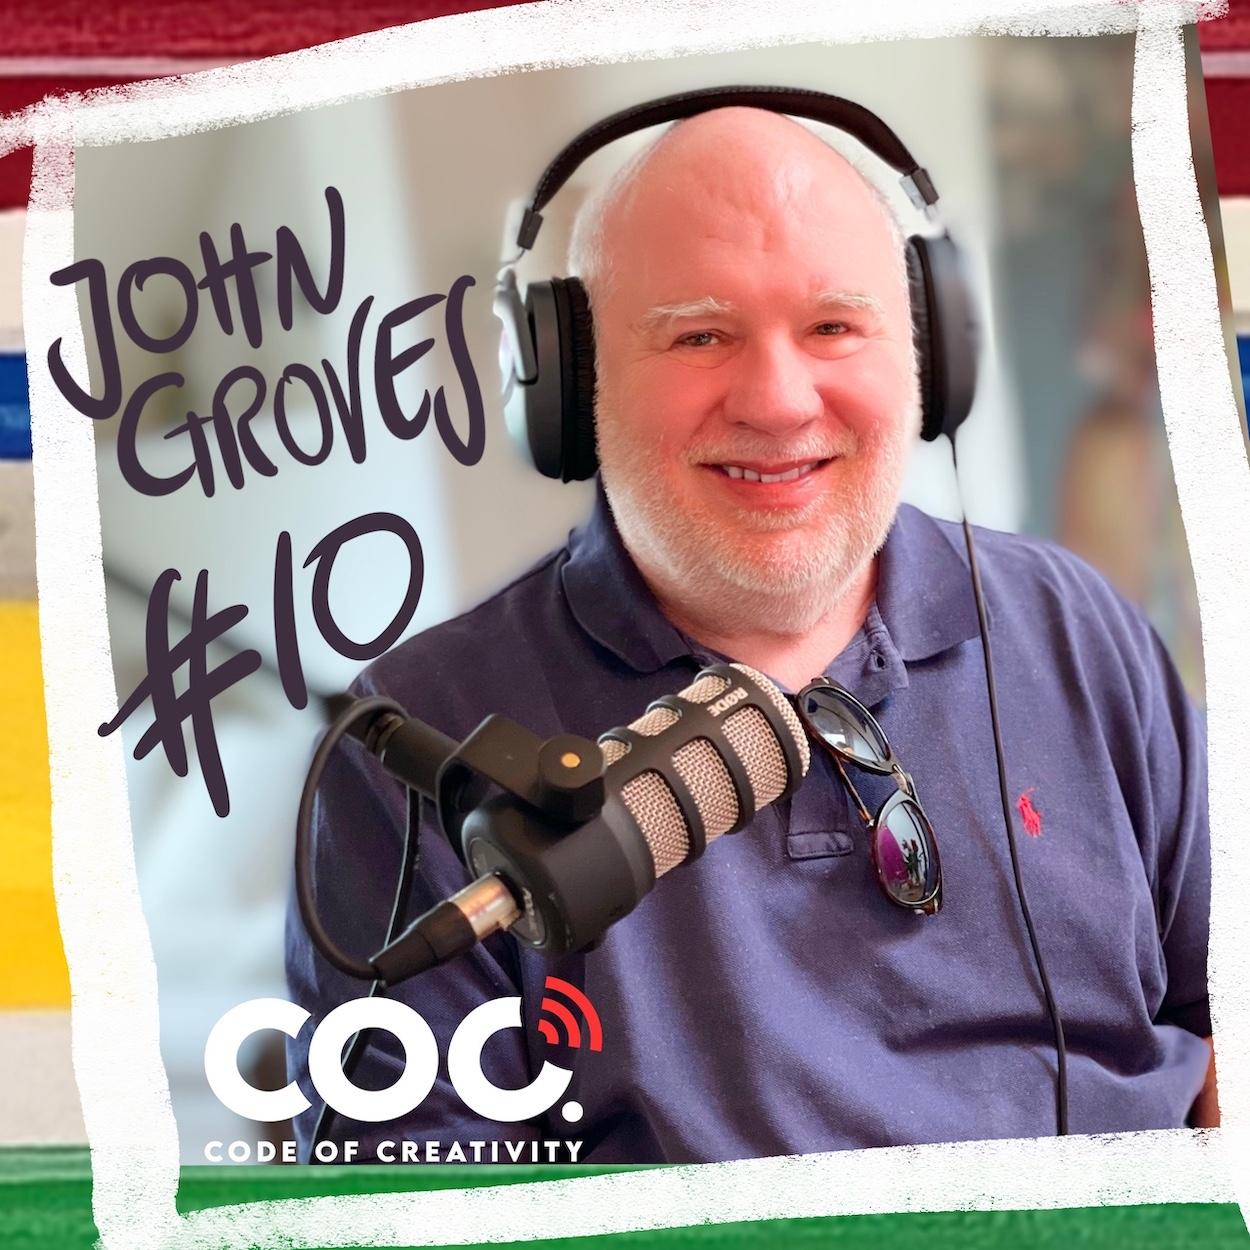 #10 John Groves - Komponist - Musikproduzent - App Creator